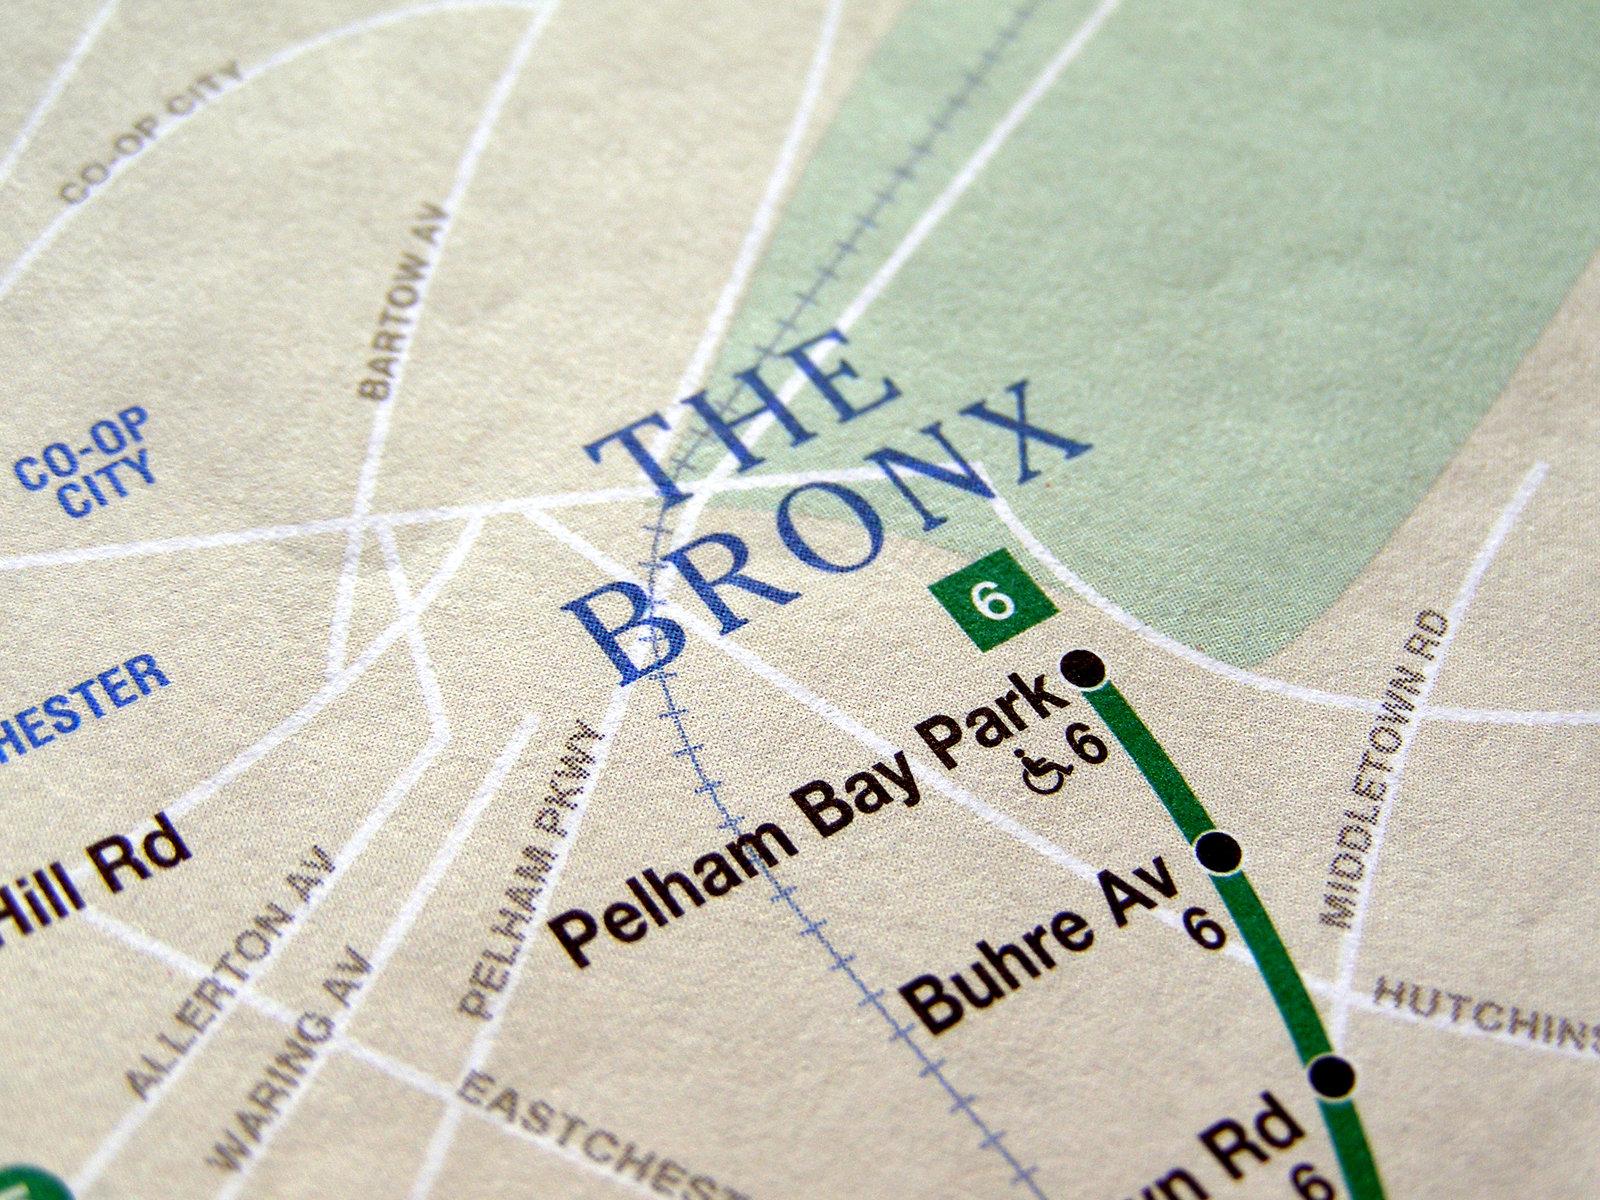 Schuylerville Bronx, NY Private Investigator